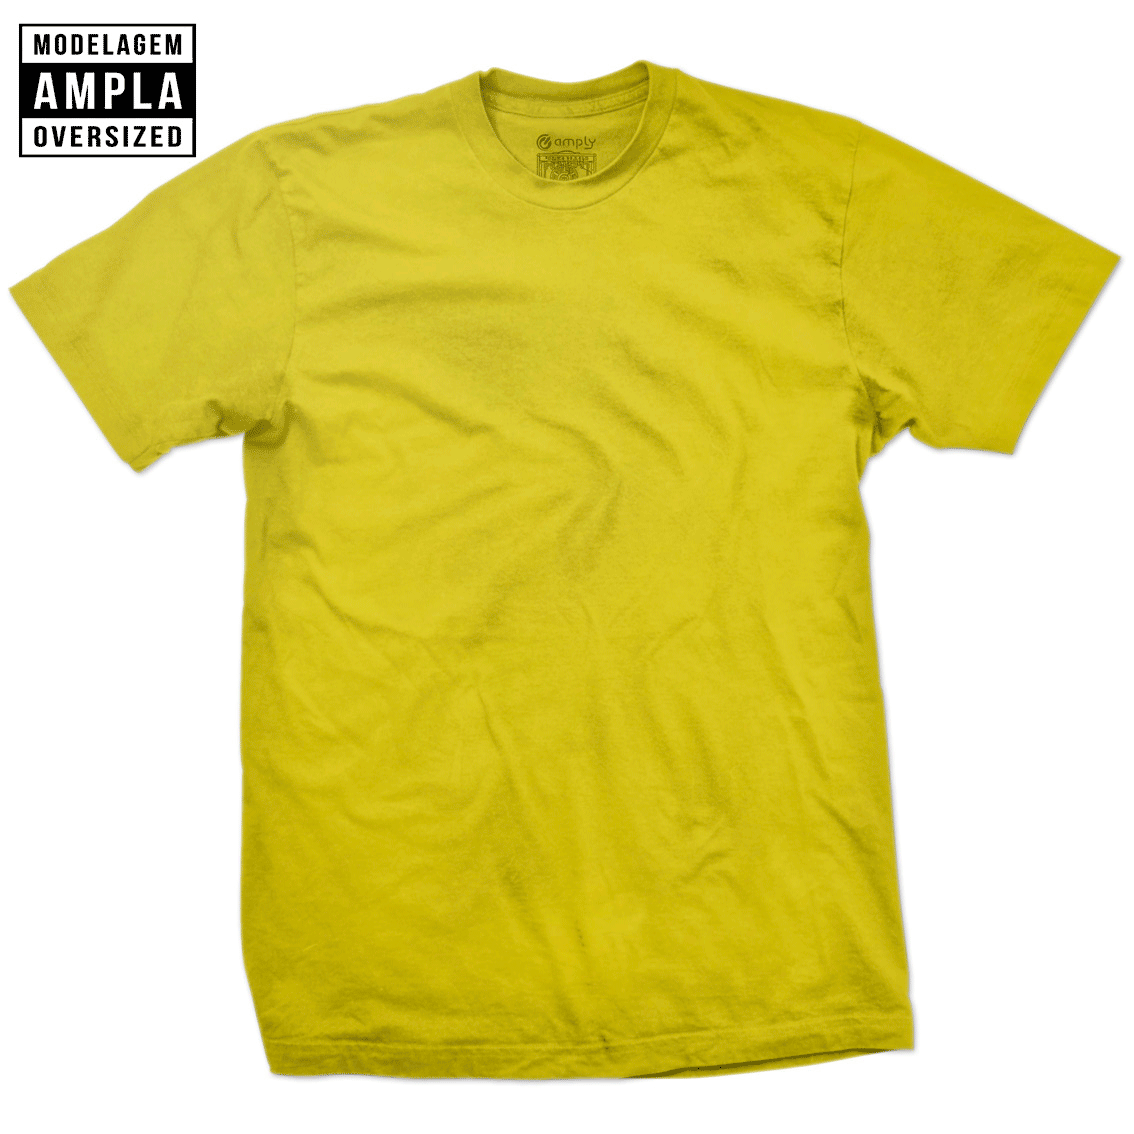 Camiseta Básica Oversized Amarela